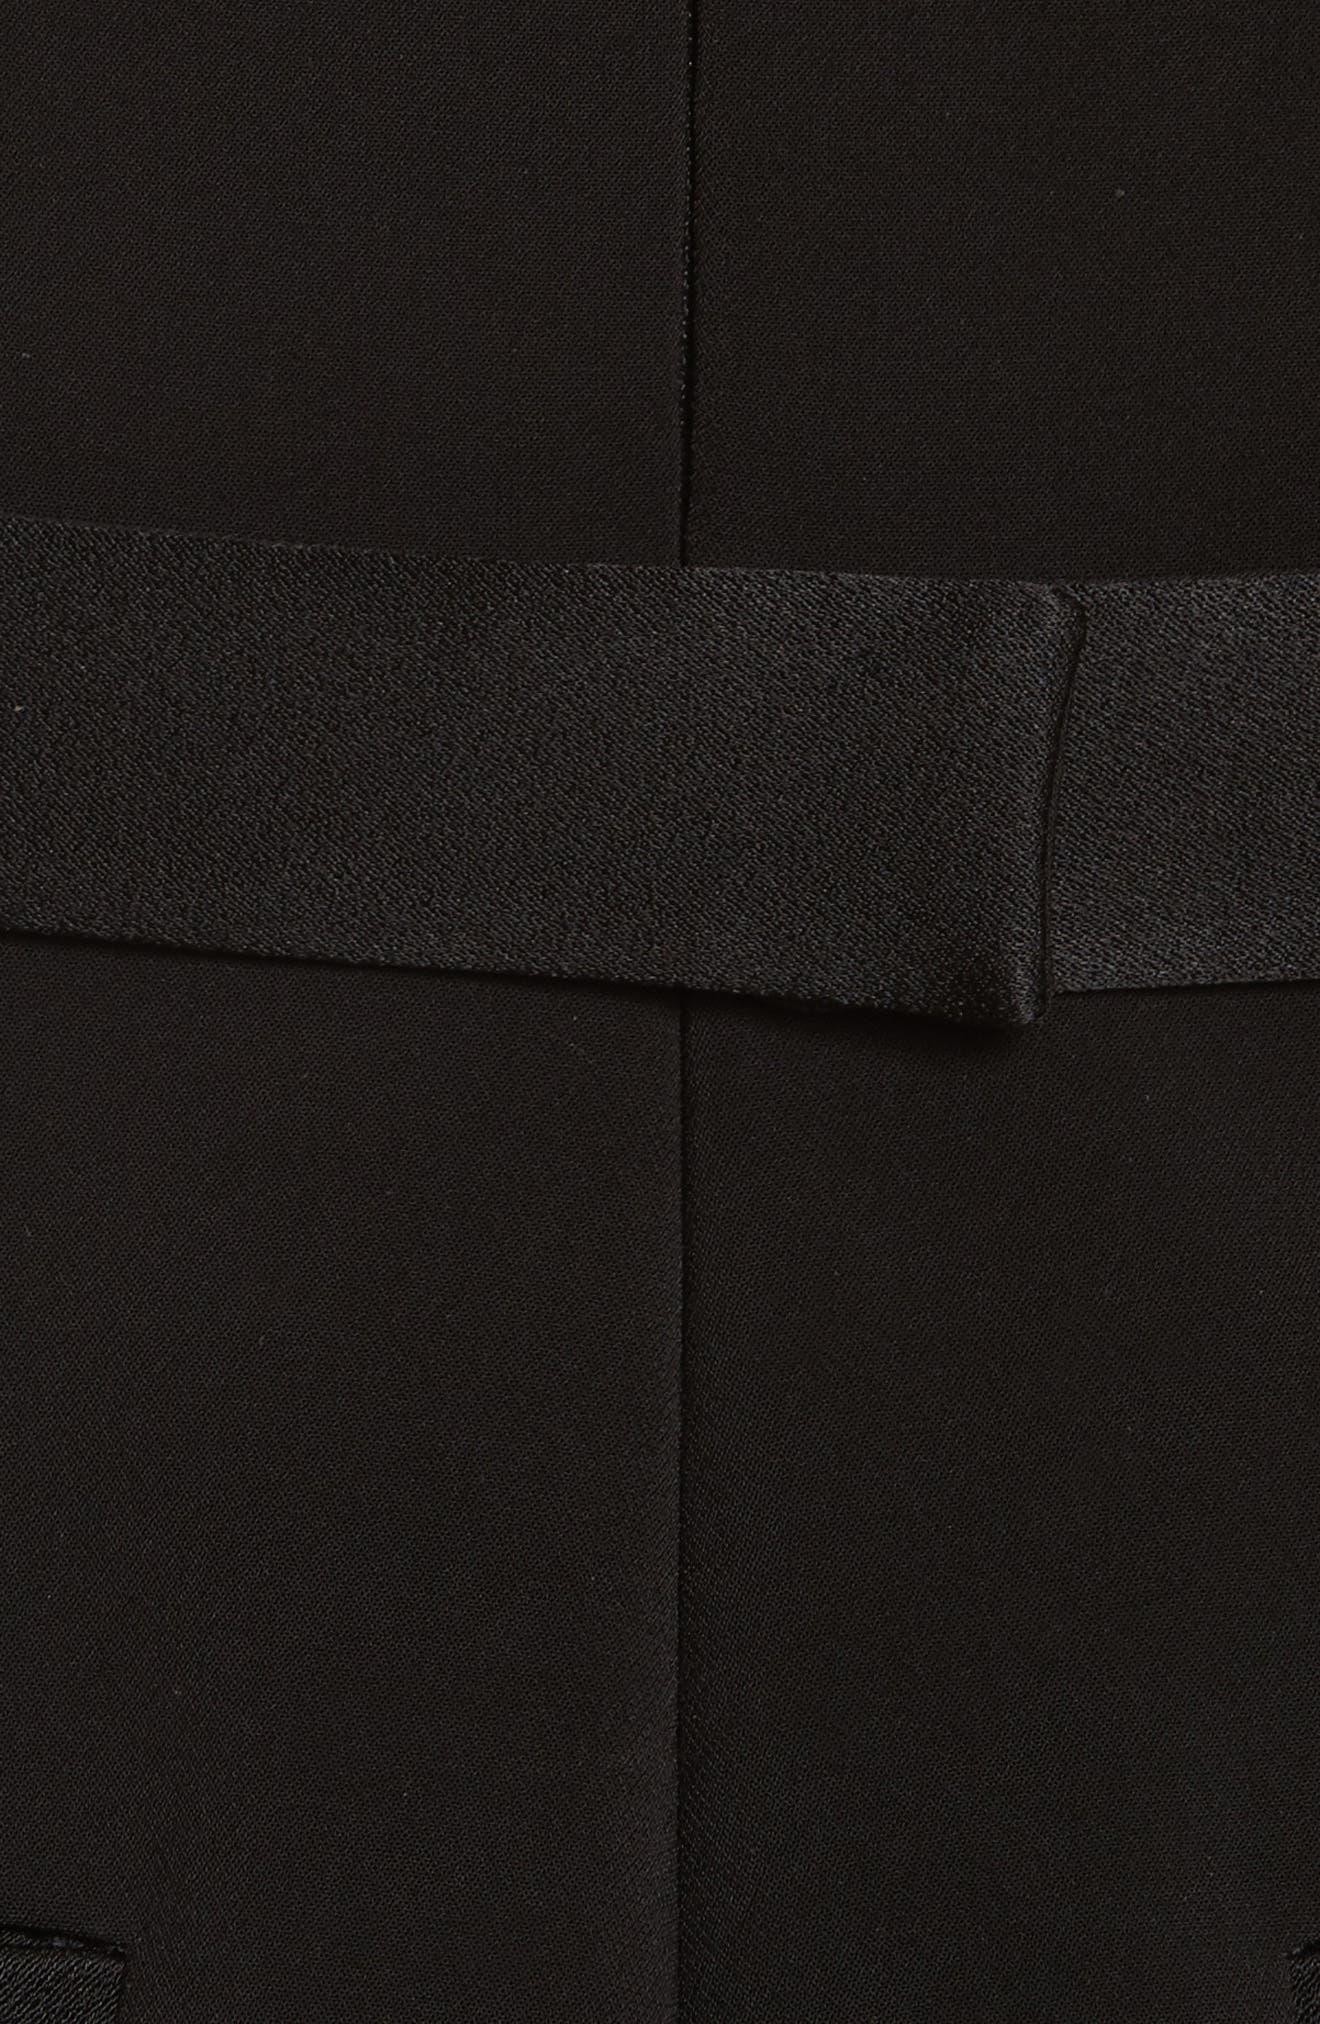 Diane Kruger x GREY Jason Wu Crepe Straight Leg Jumpsuit,                             Alternate thumbnail 5, color,                             001